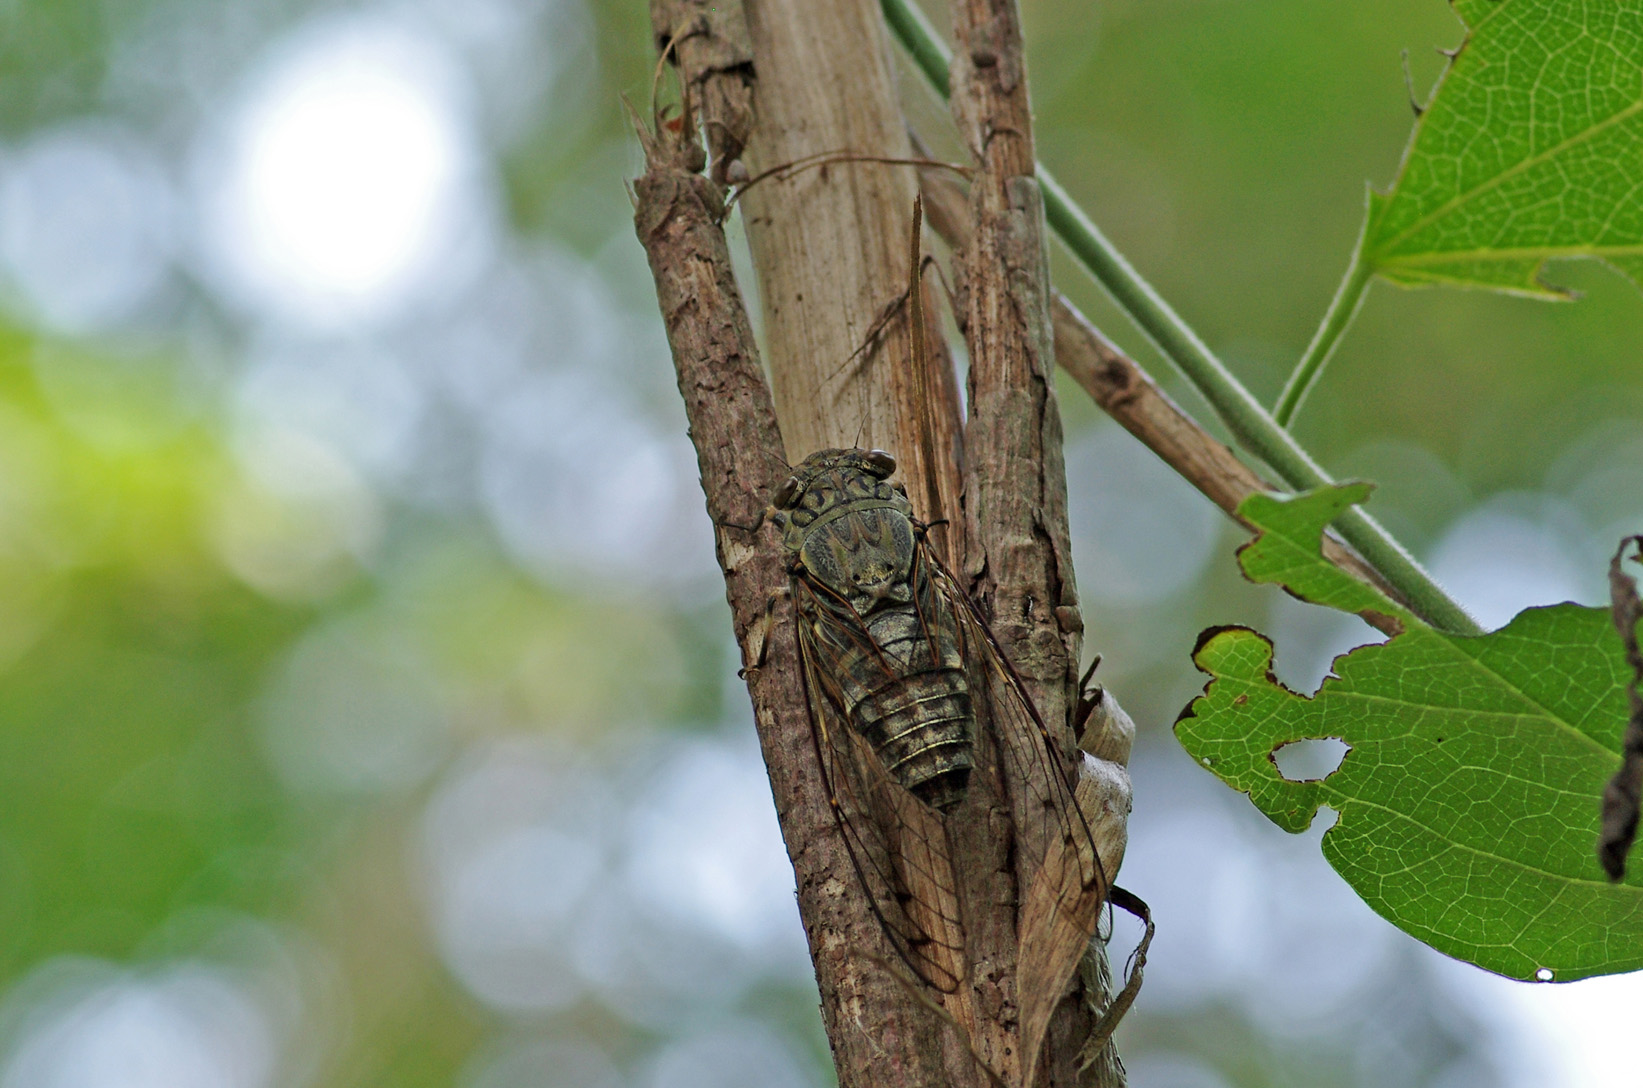 Cigale Tsukutsukubôshi, Meimuna opalifera, mâle à Nara au Japon en août 2013). Chant de l'espèce : oooshine-tsoukoutsoukou...